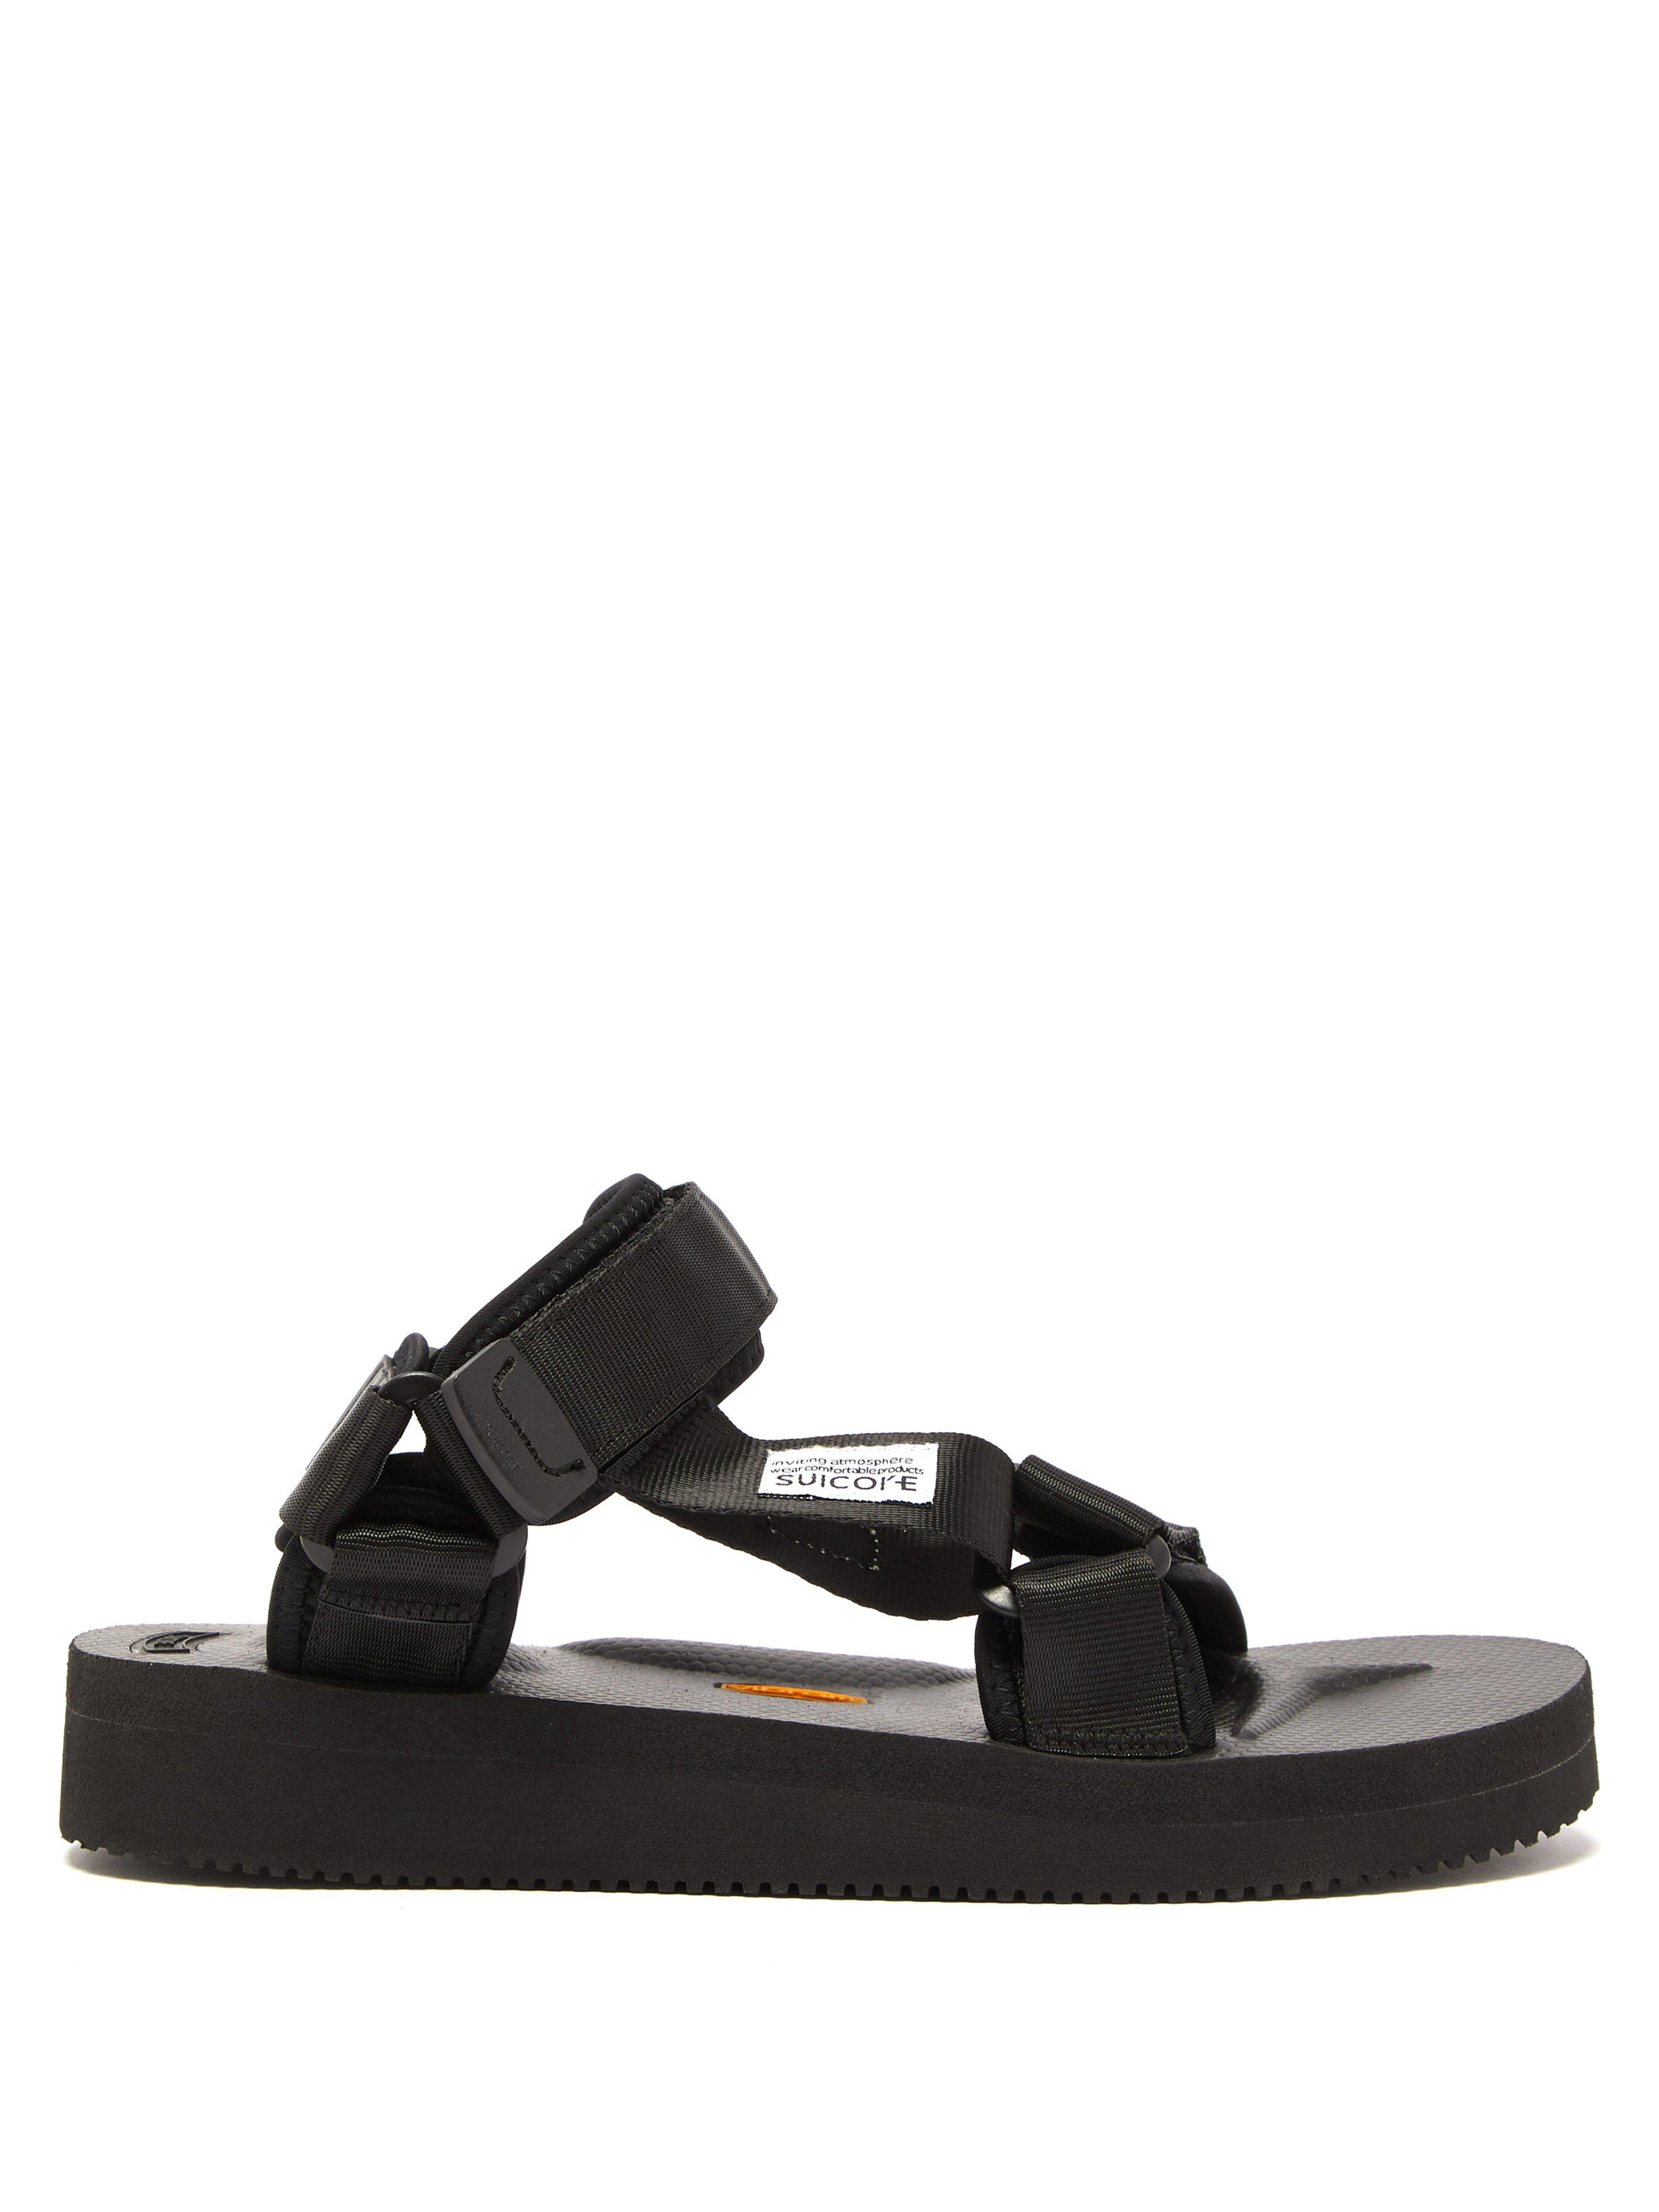 edd2cf46035 Suicoke Depa V2 Velcro Strap Sandals in Black - Lyst